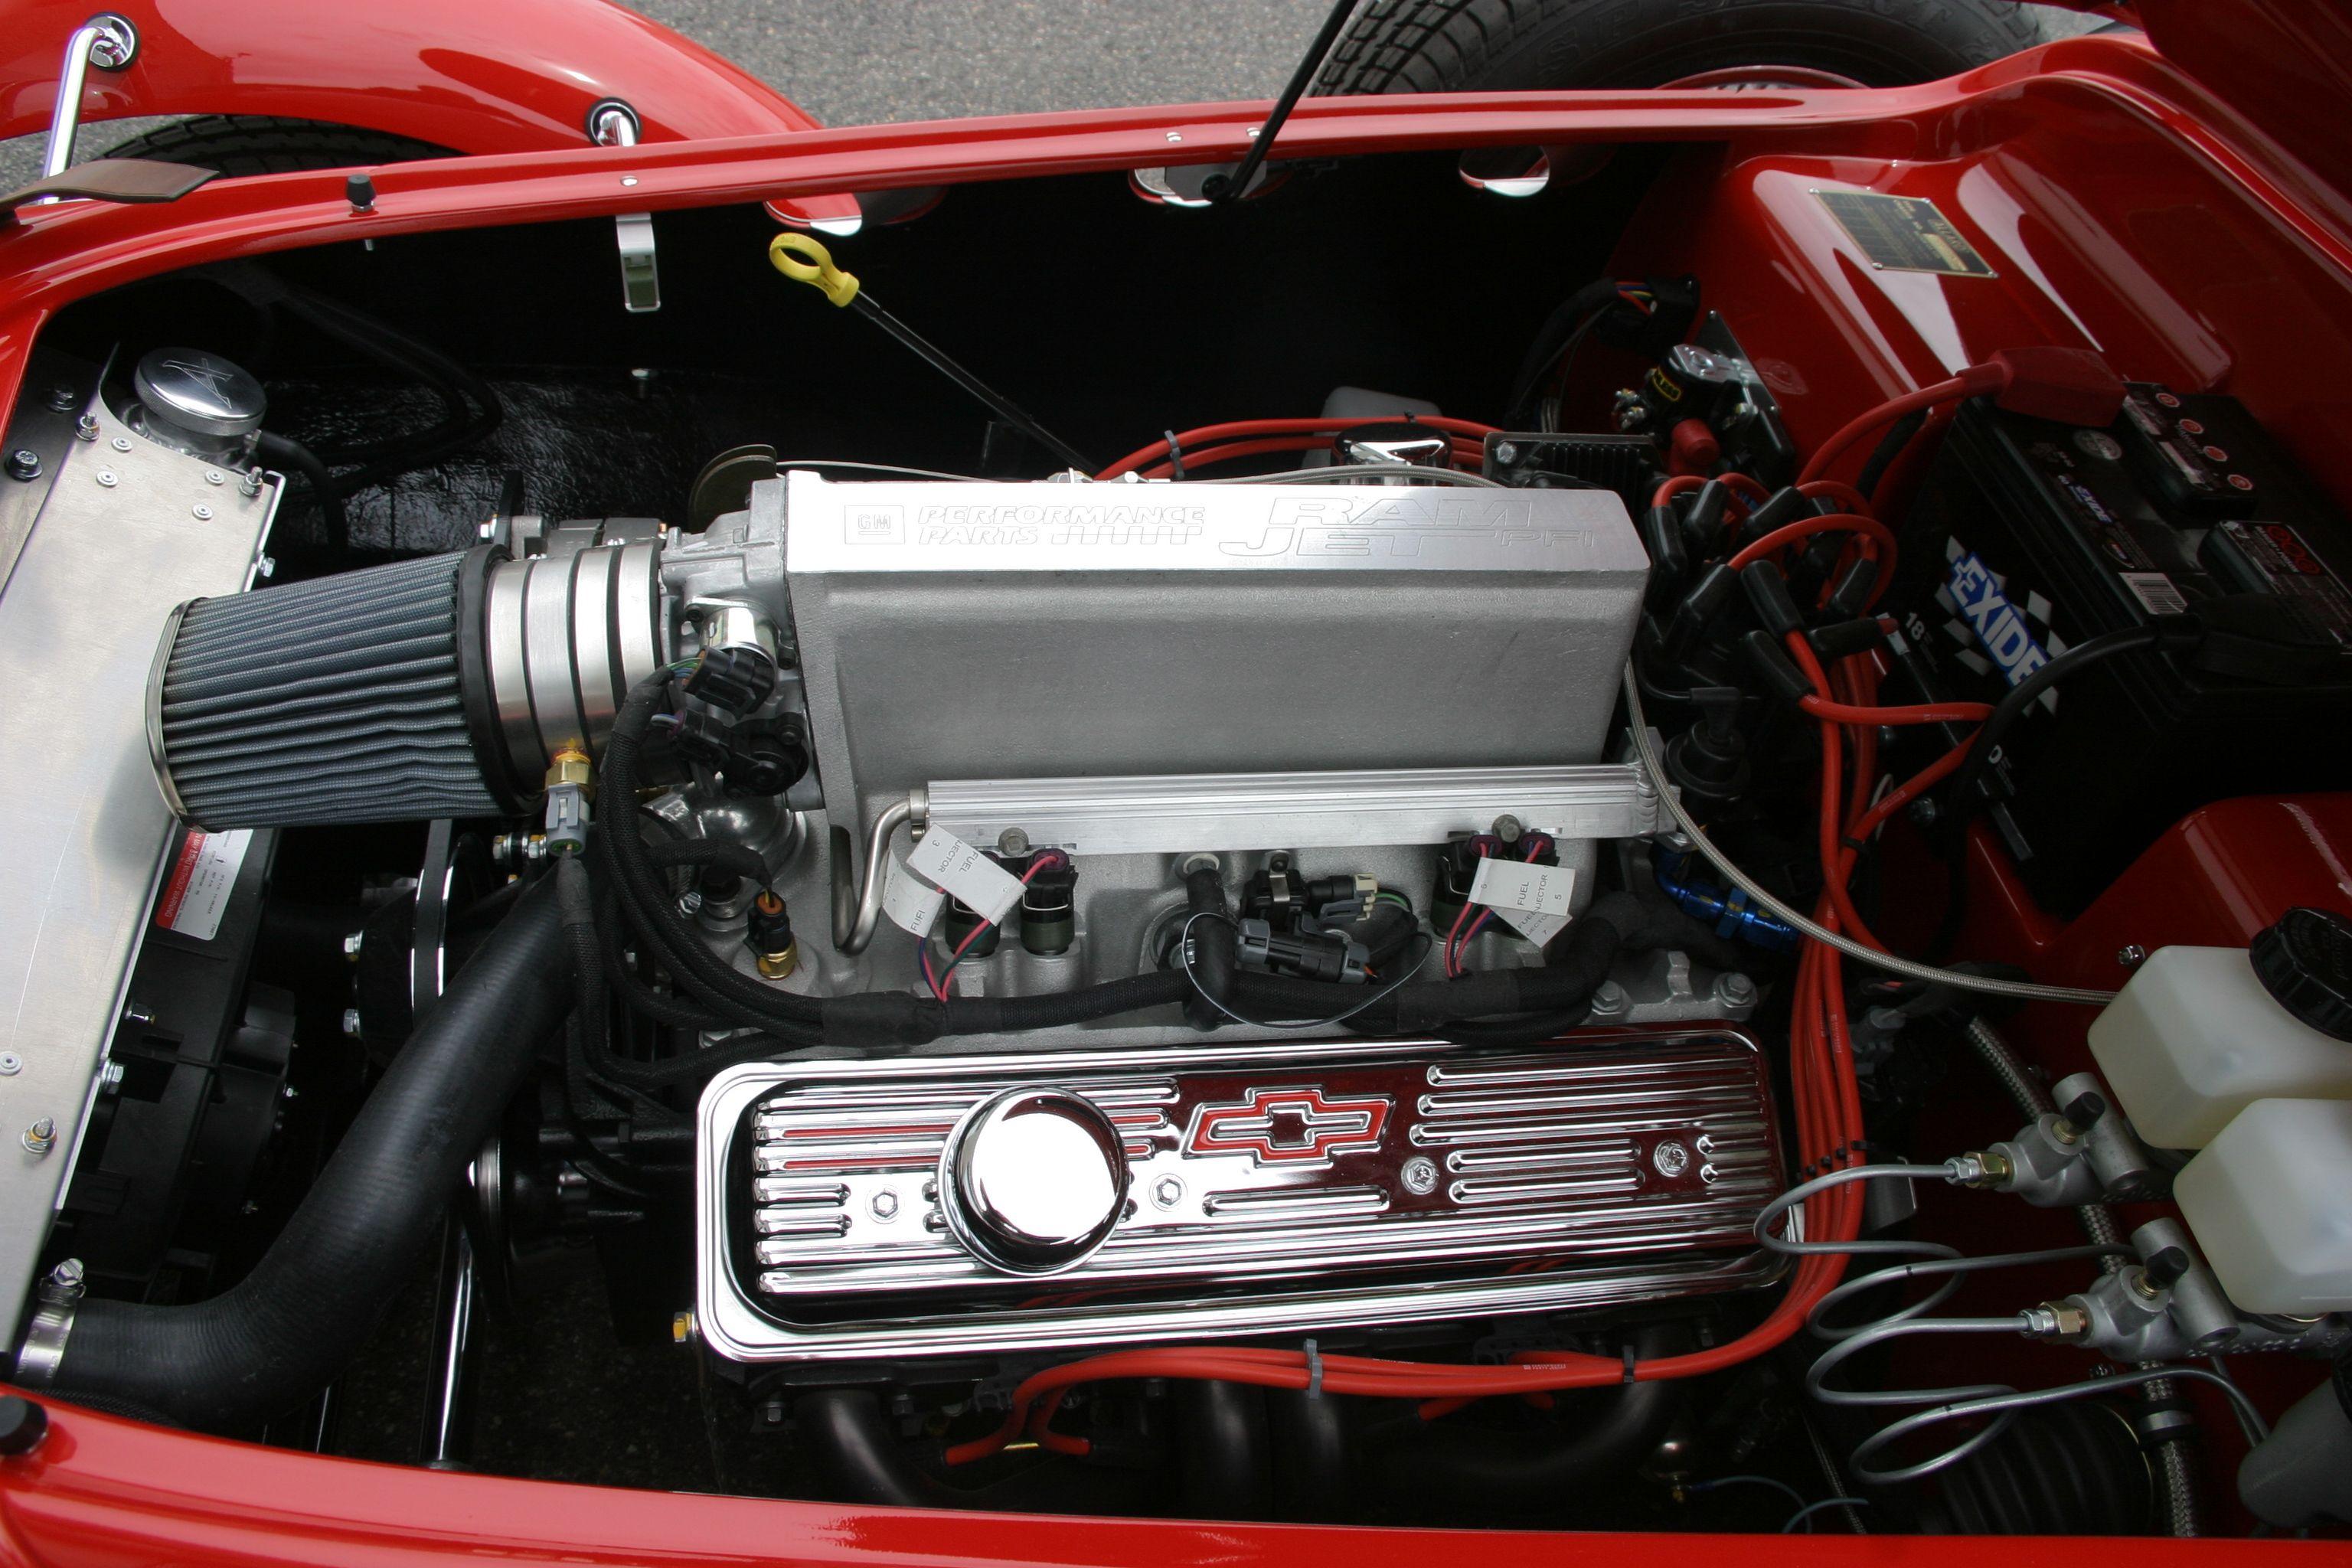 Gm Ramjet 350 Pfi Corvette Ls1 Vortek Heads Puts Out 350 Hp